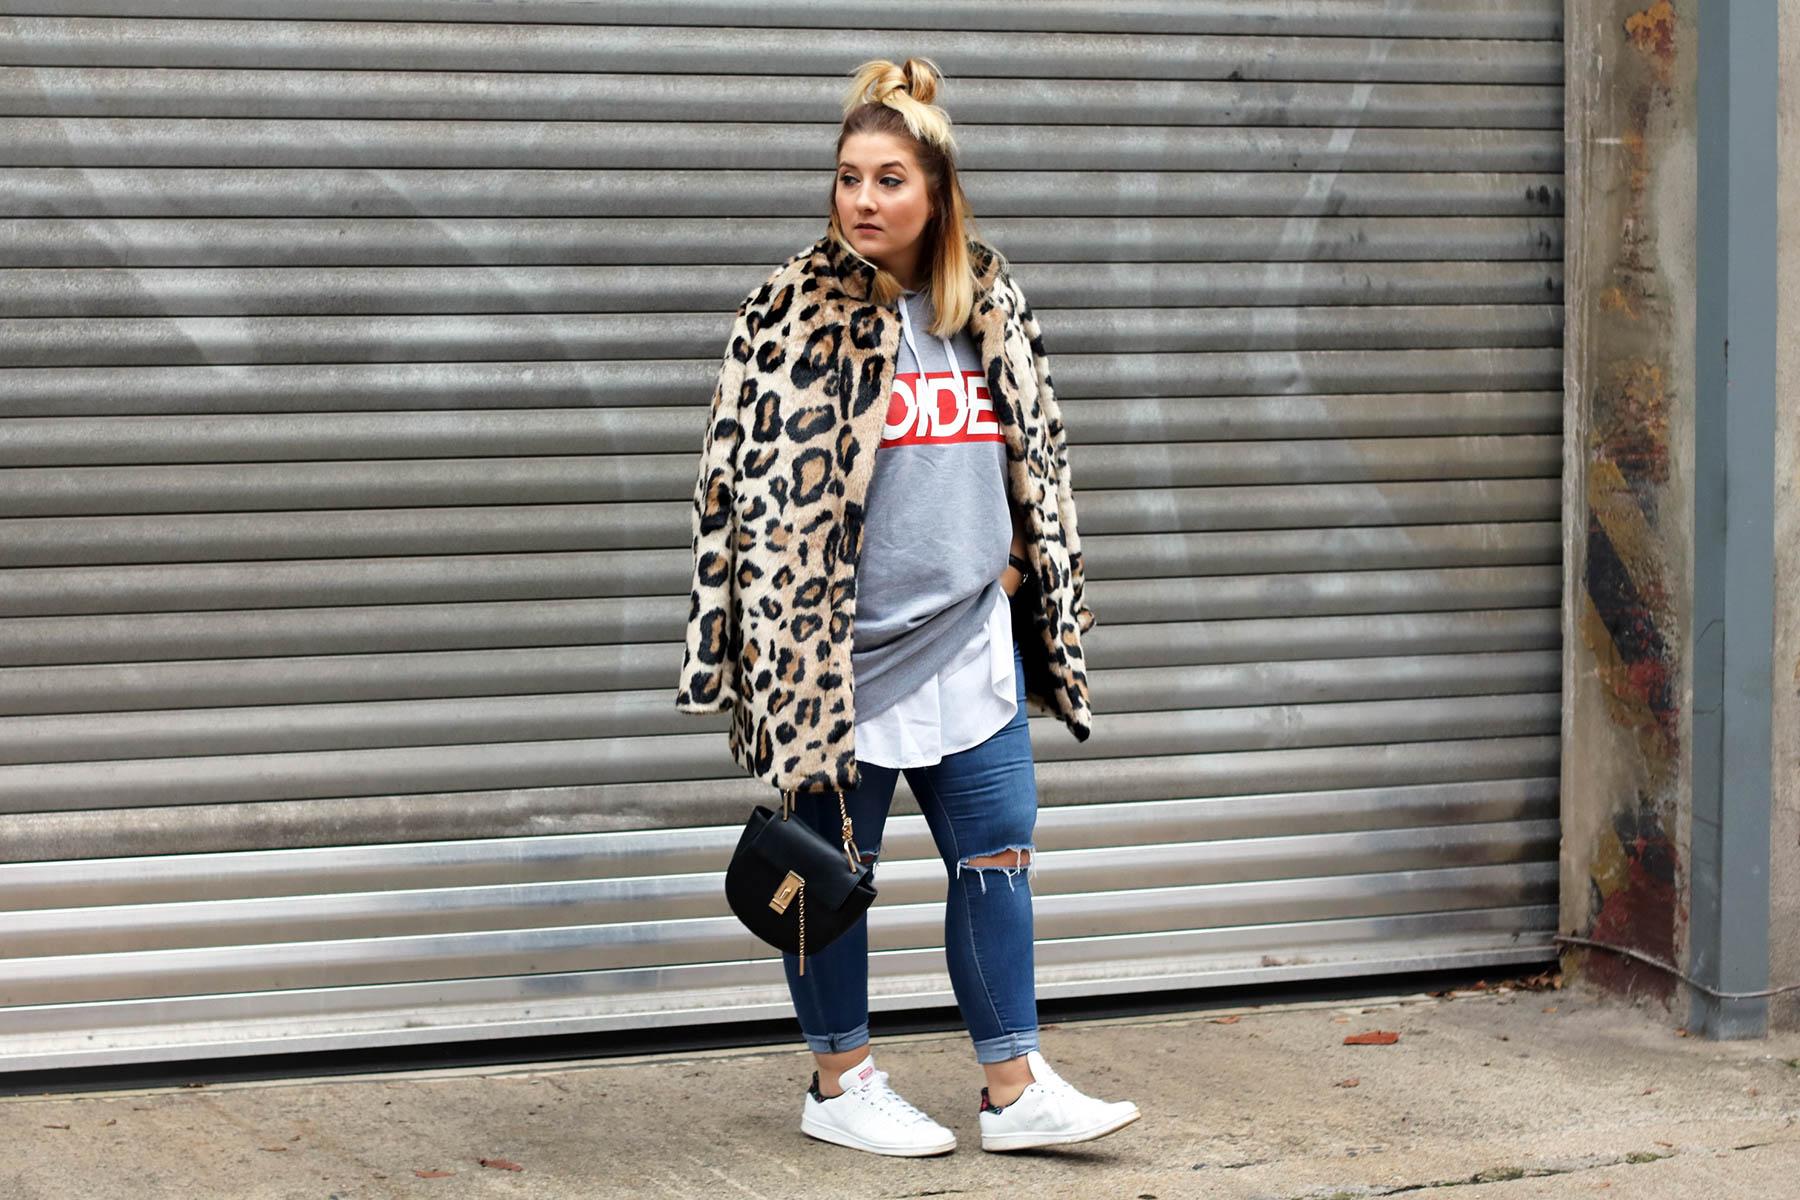 outfit-modeblog-fashionblog-fashionpassionlove-leo-mantel-trend-mantel-winter-sneaker-adidas24 (1 von 1)